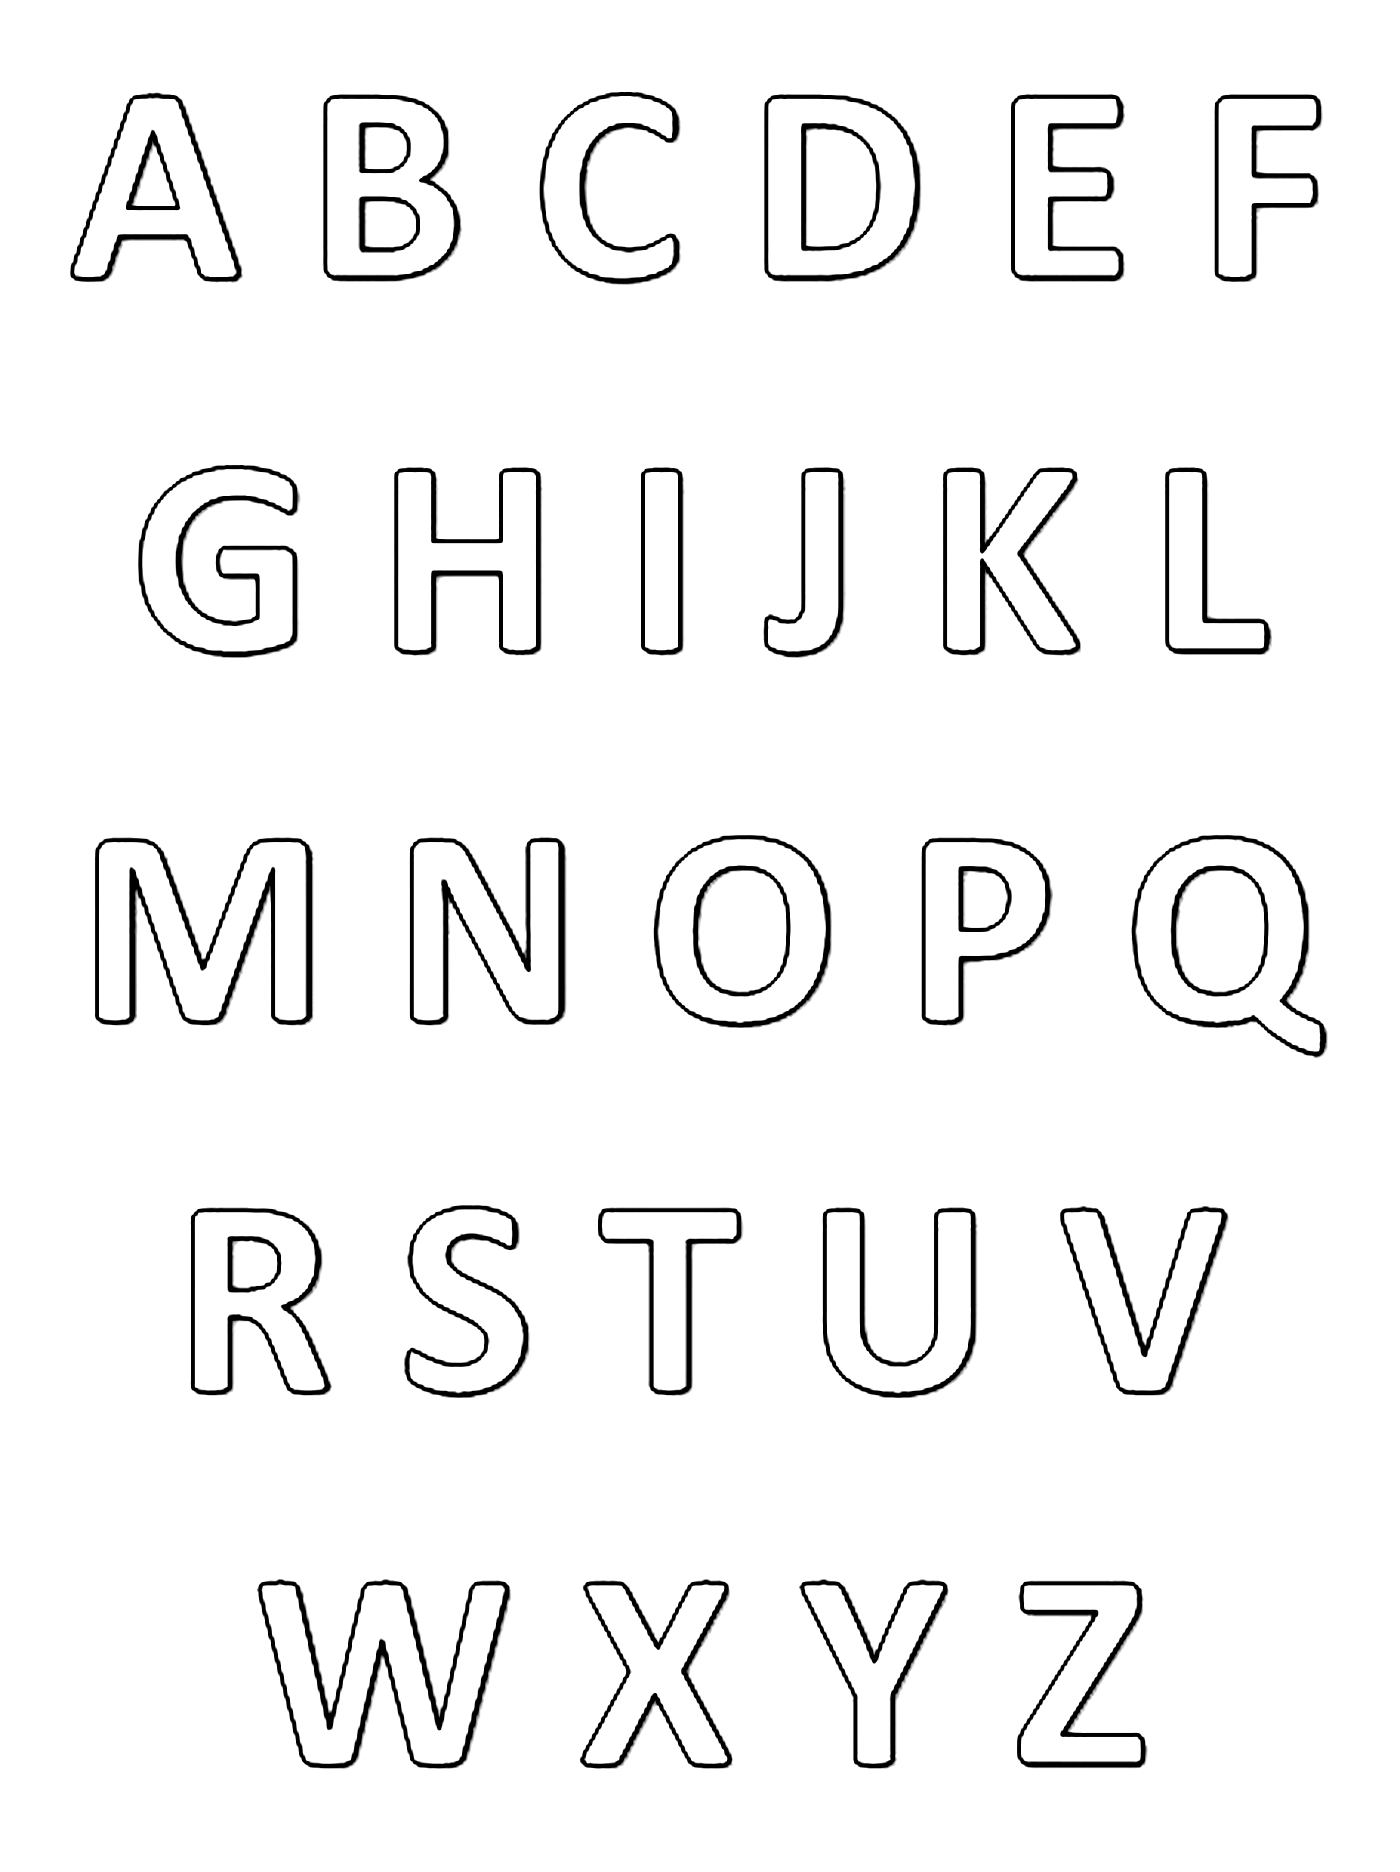 Alfabeto 61663 - Alfabeto - Colorear para Adultos